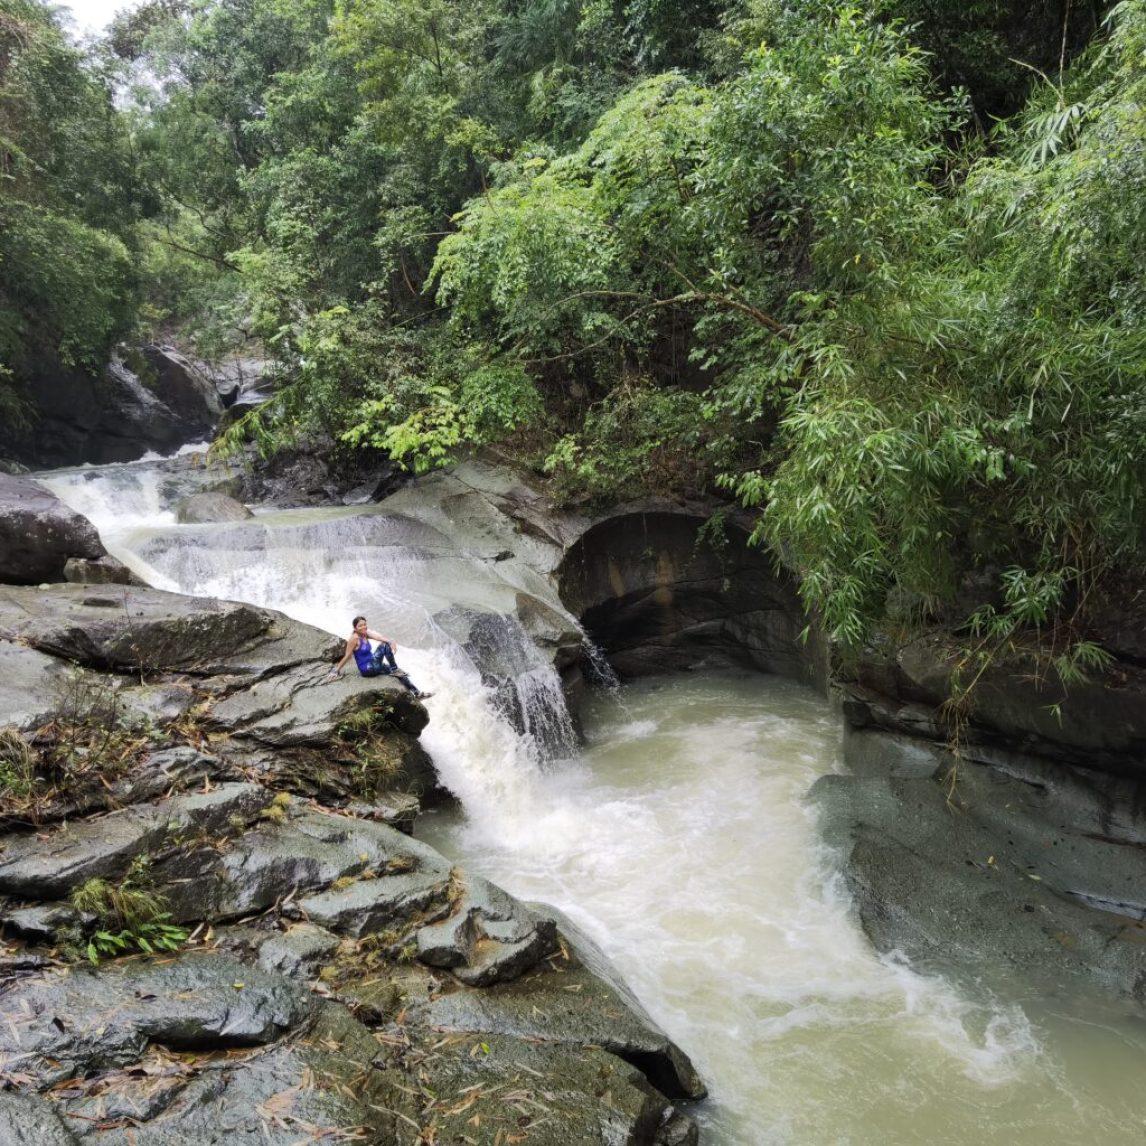 Tenth Falls